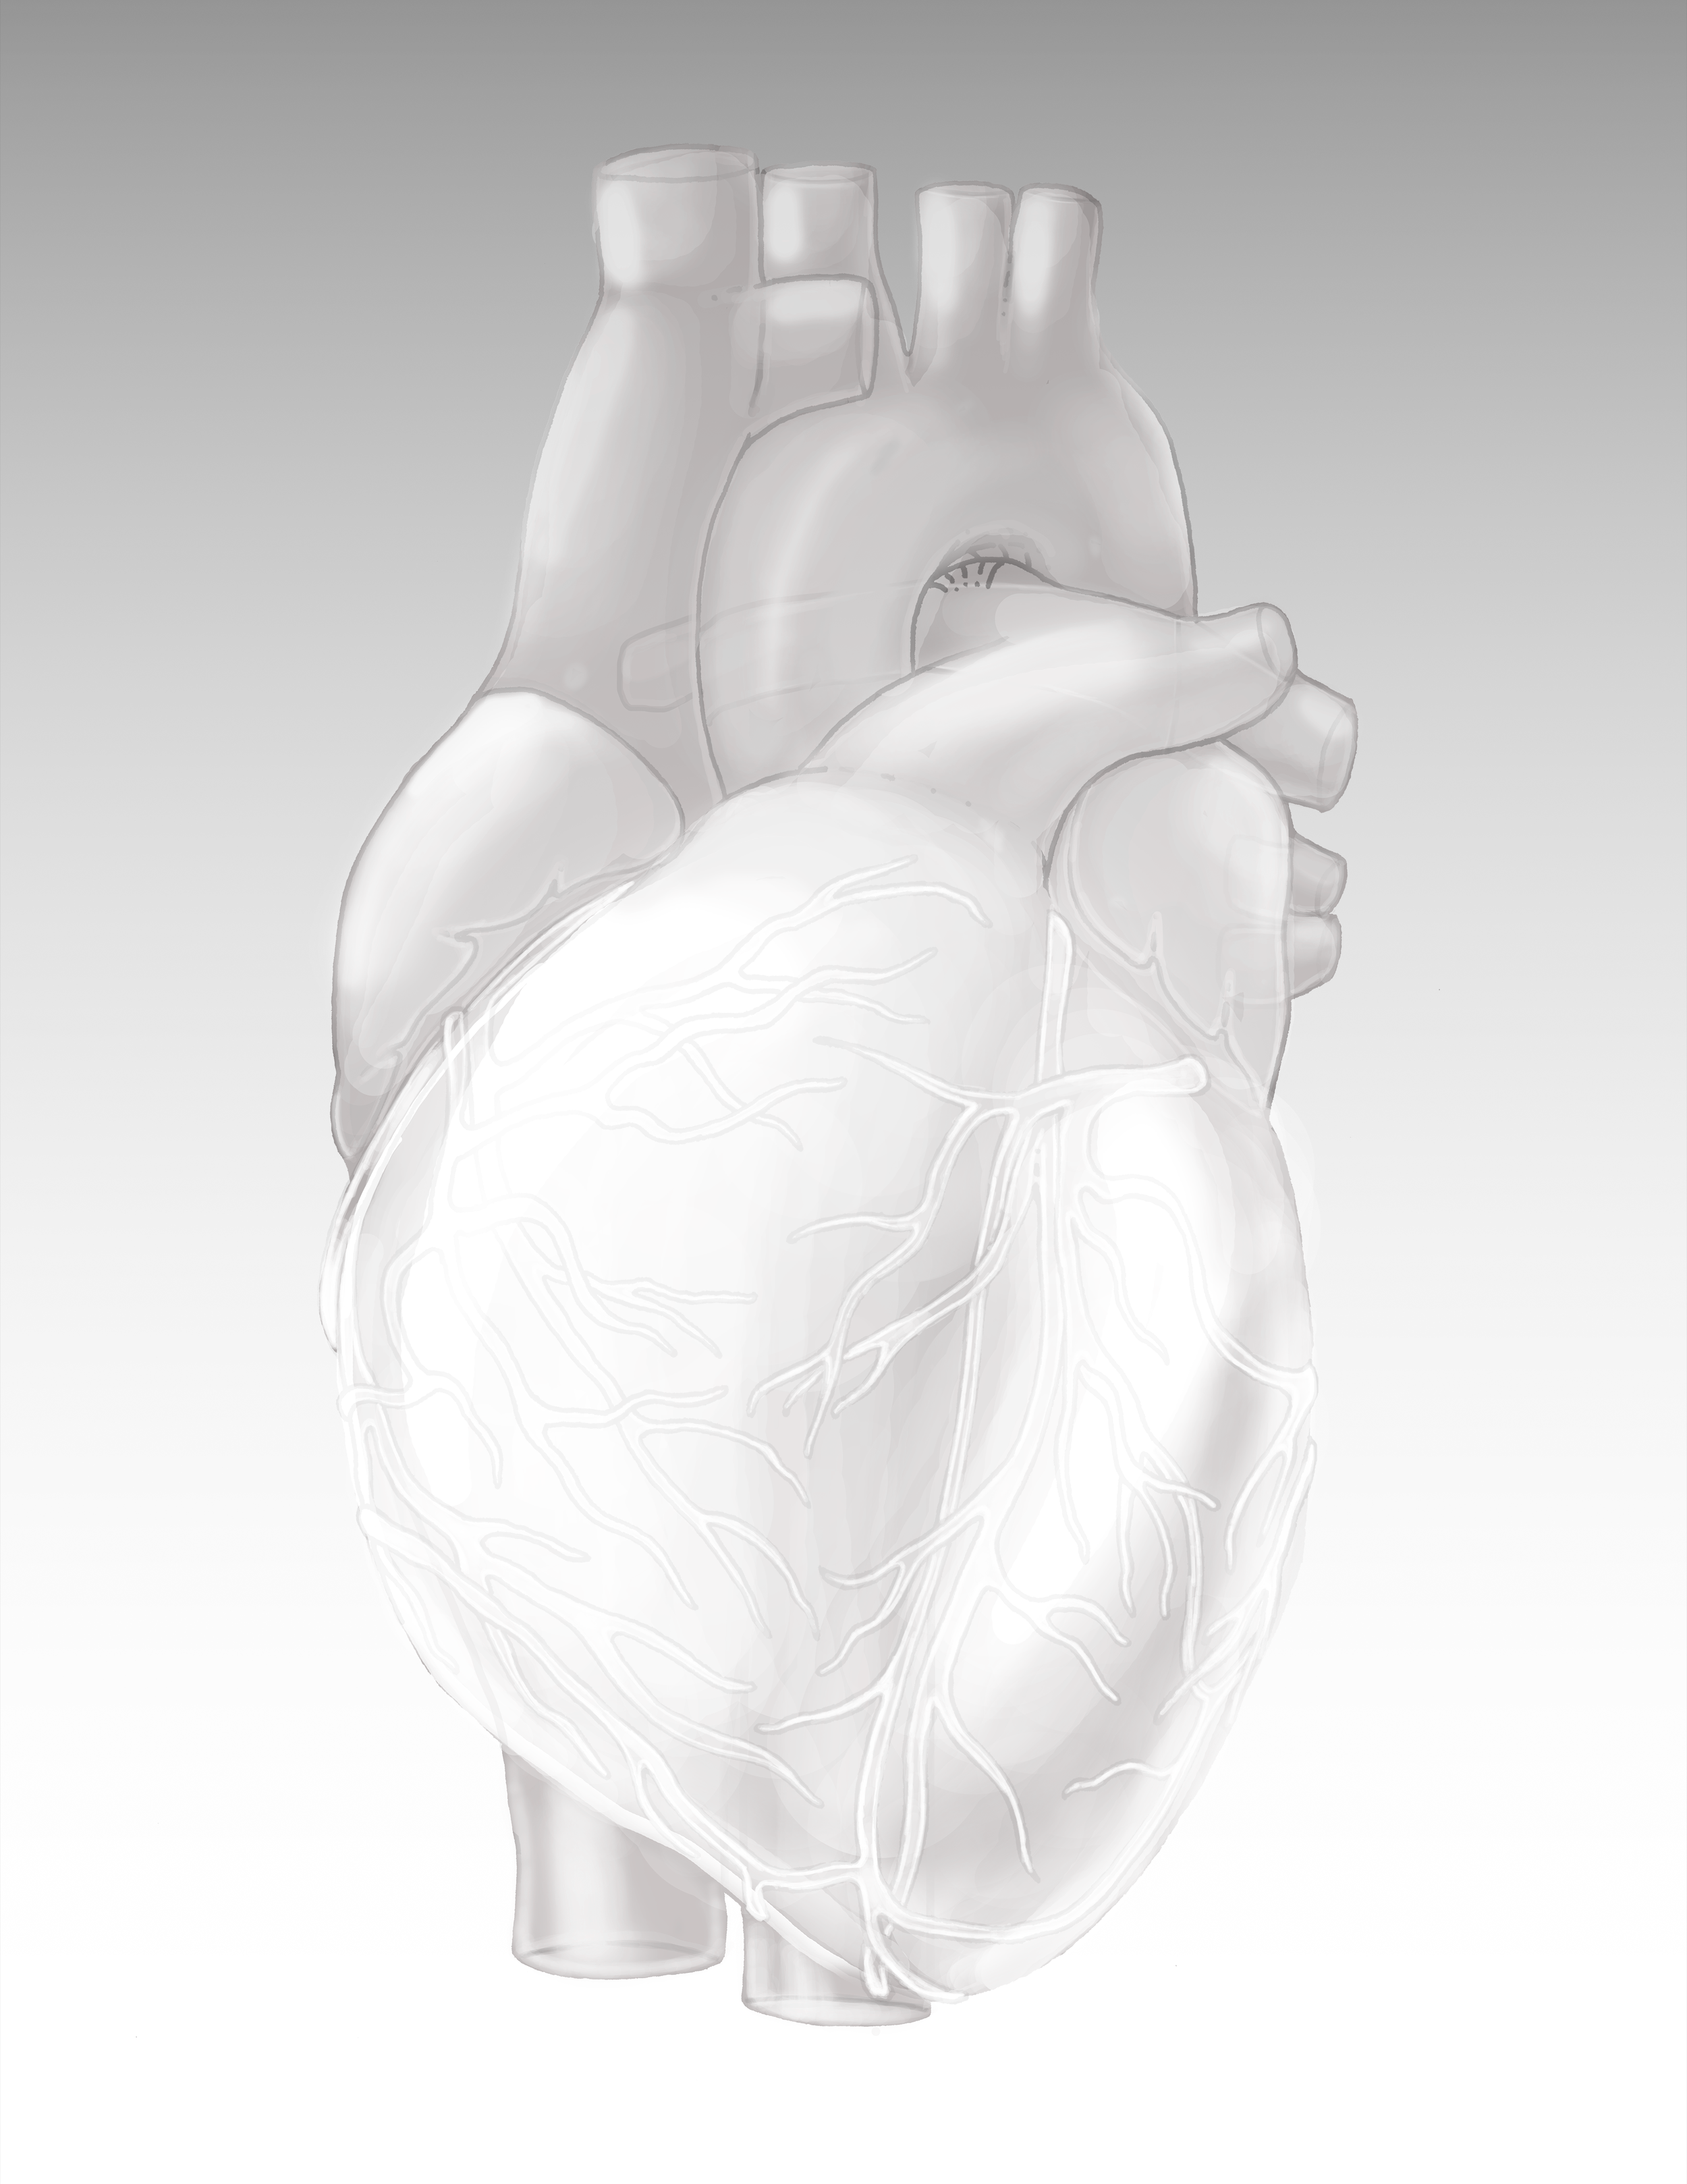 Glass Heart IV, 2016